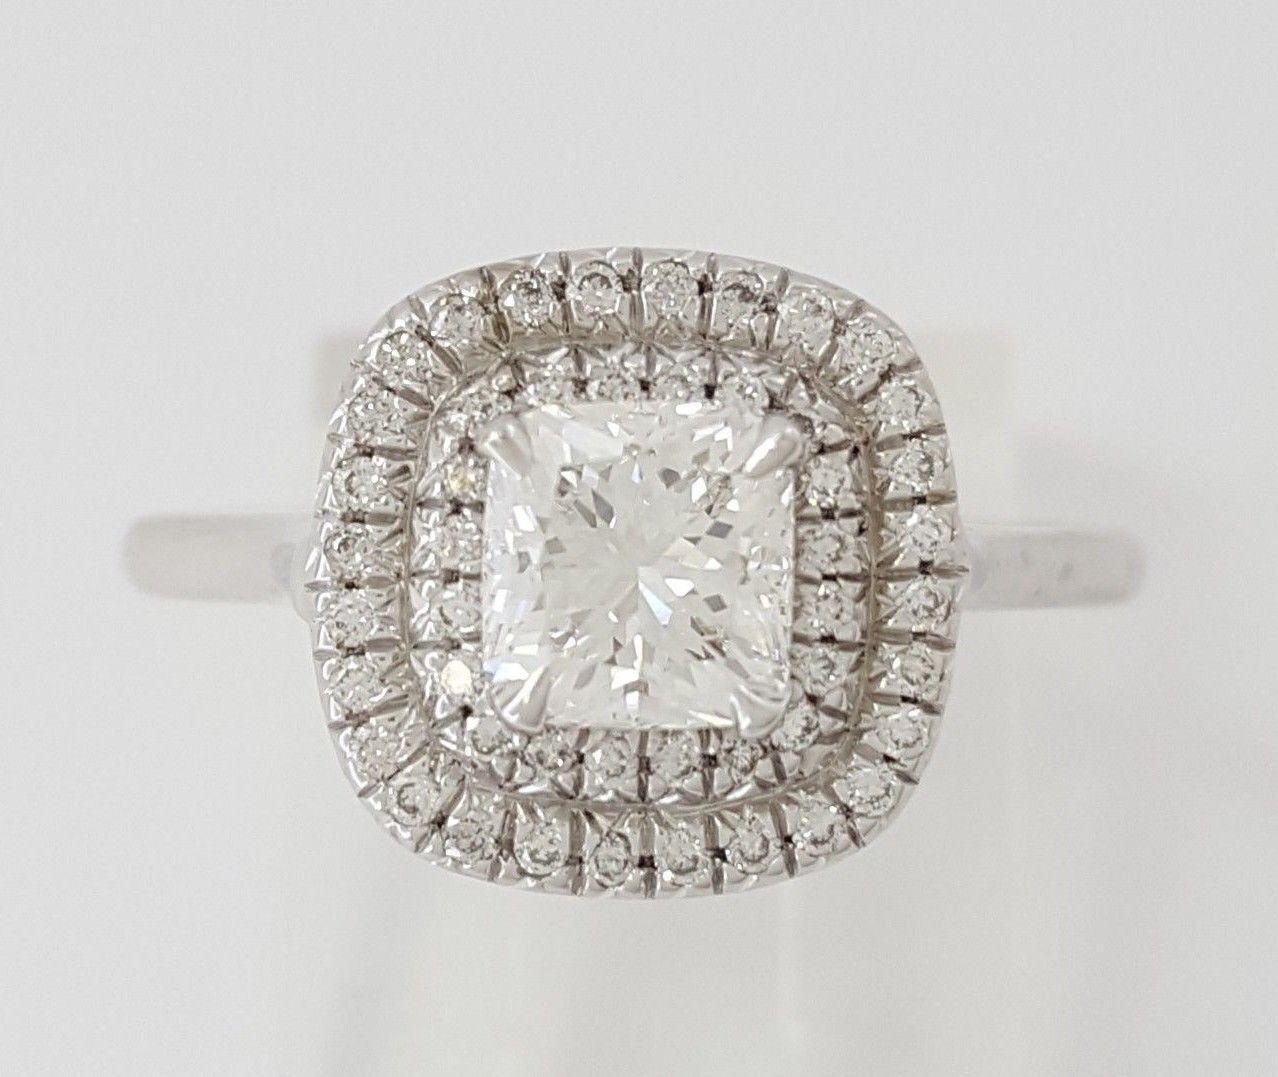 0.97 ct 18K White Gold Cushion Cut Diamond Double Halo Engagement Ring GIA E/VS1 4